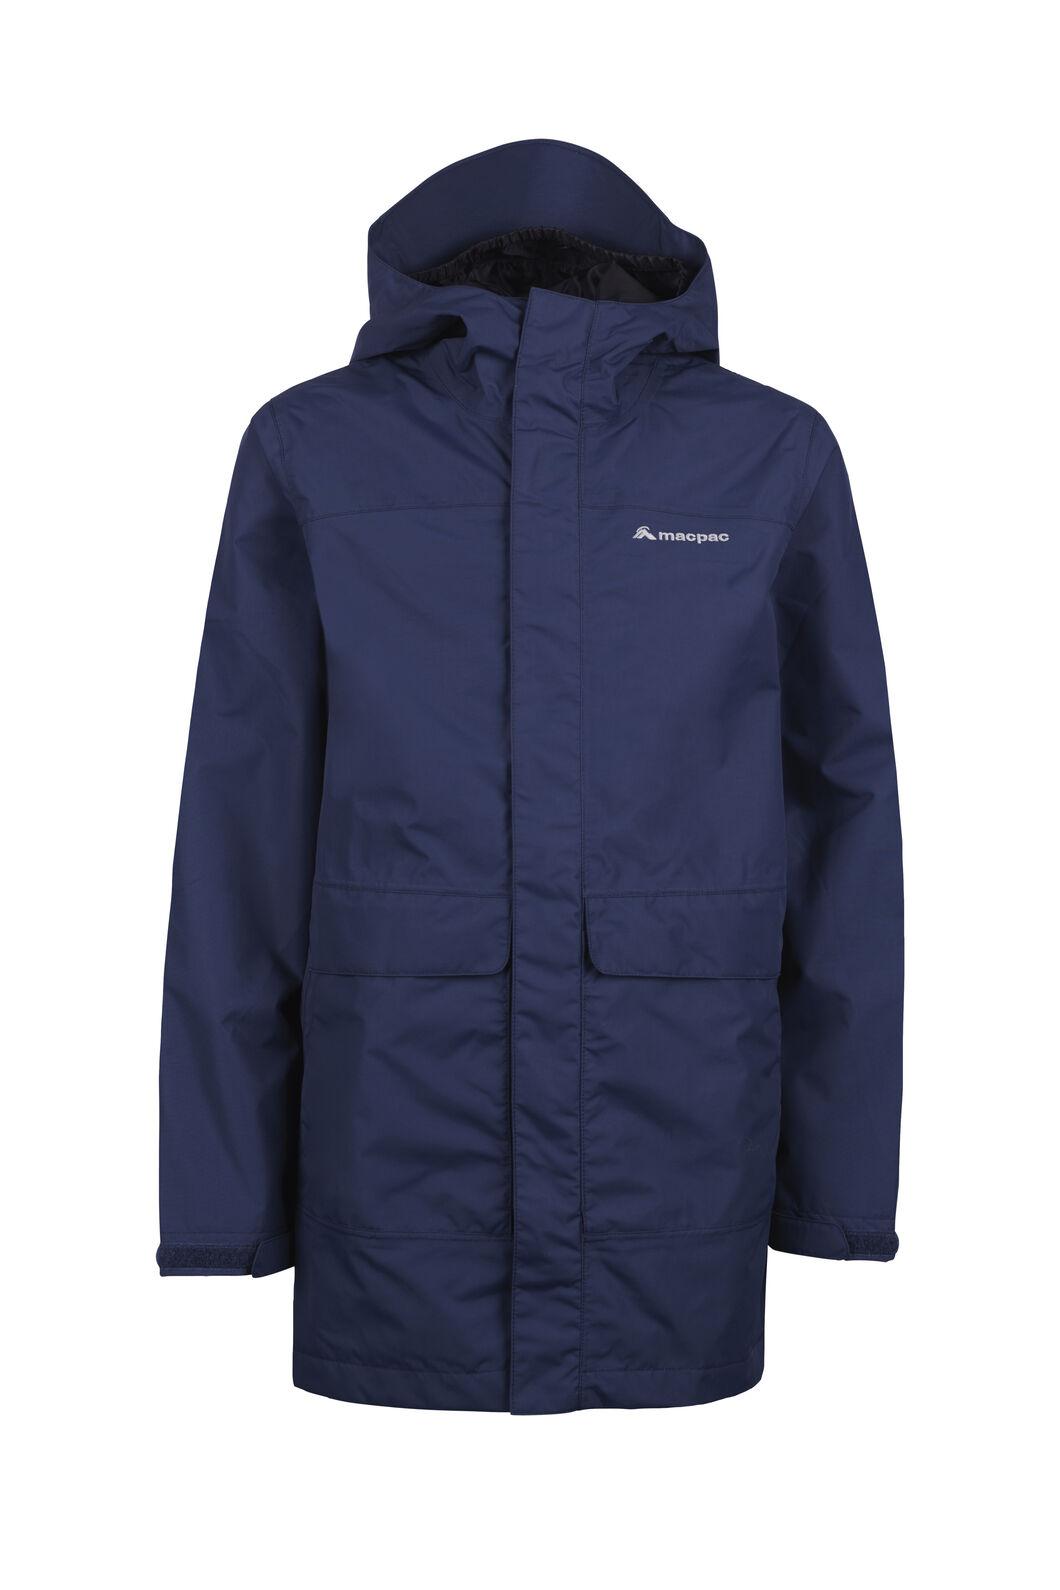 Macpac Lagoon Long Rain Jacket - Kids', Medieval Blue, hi-res